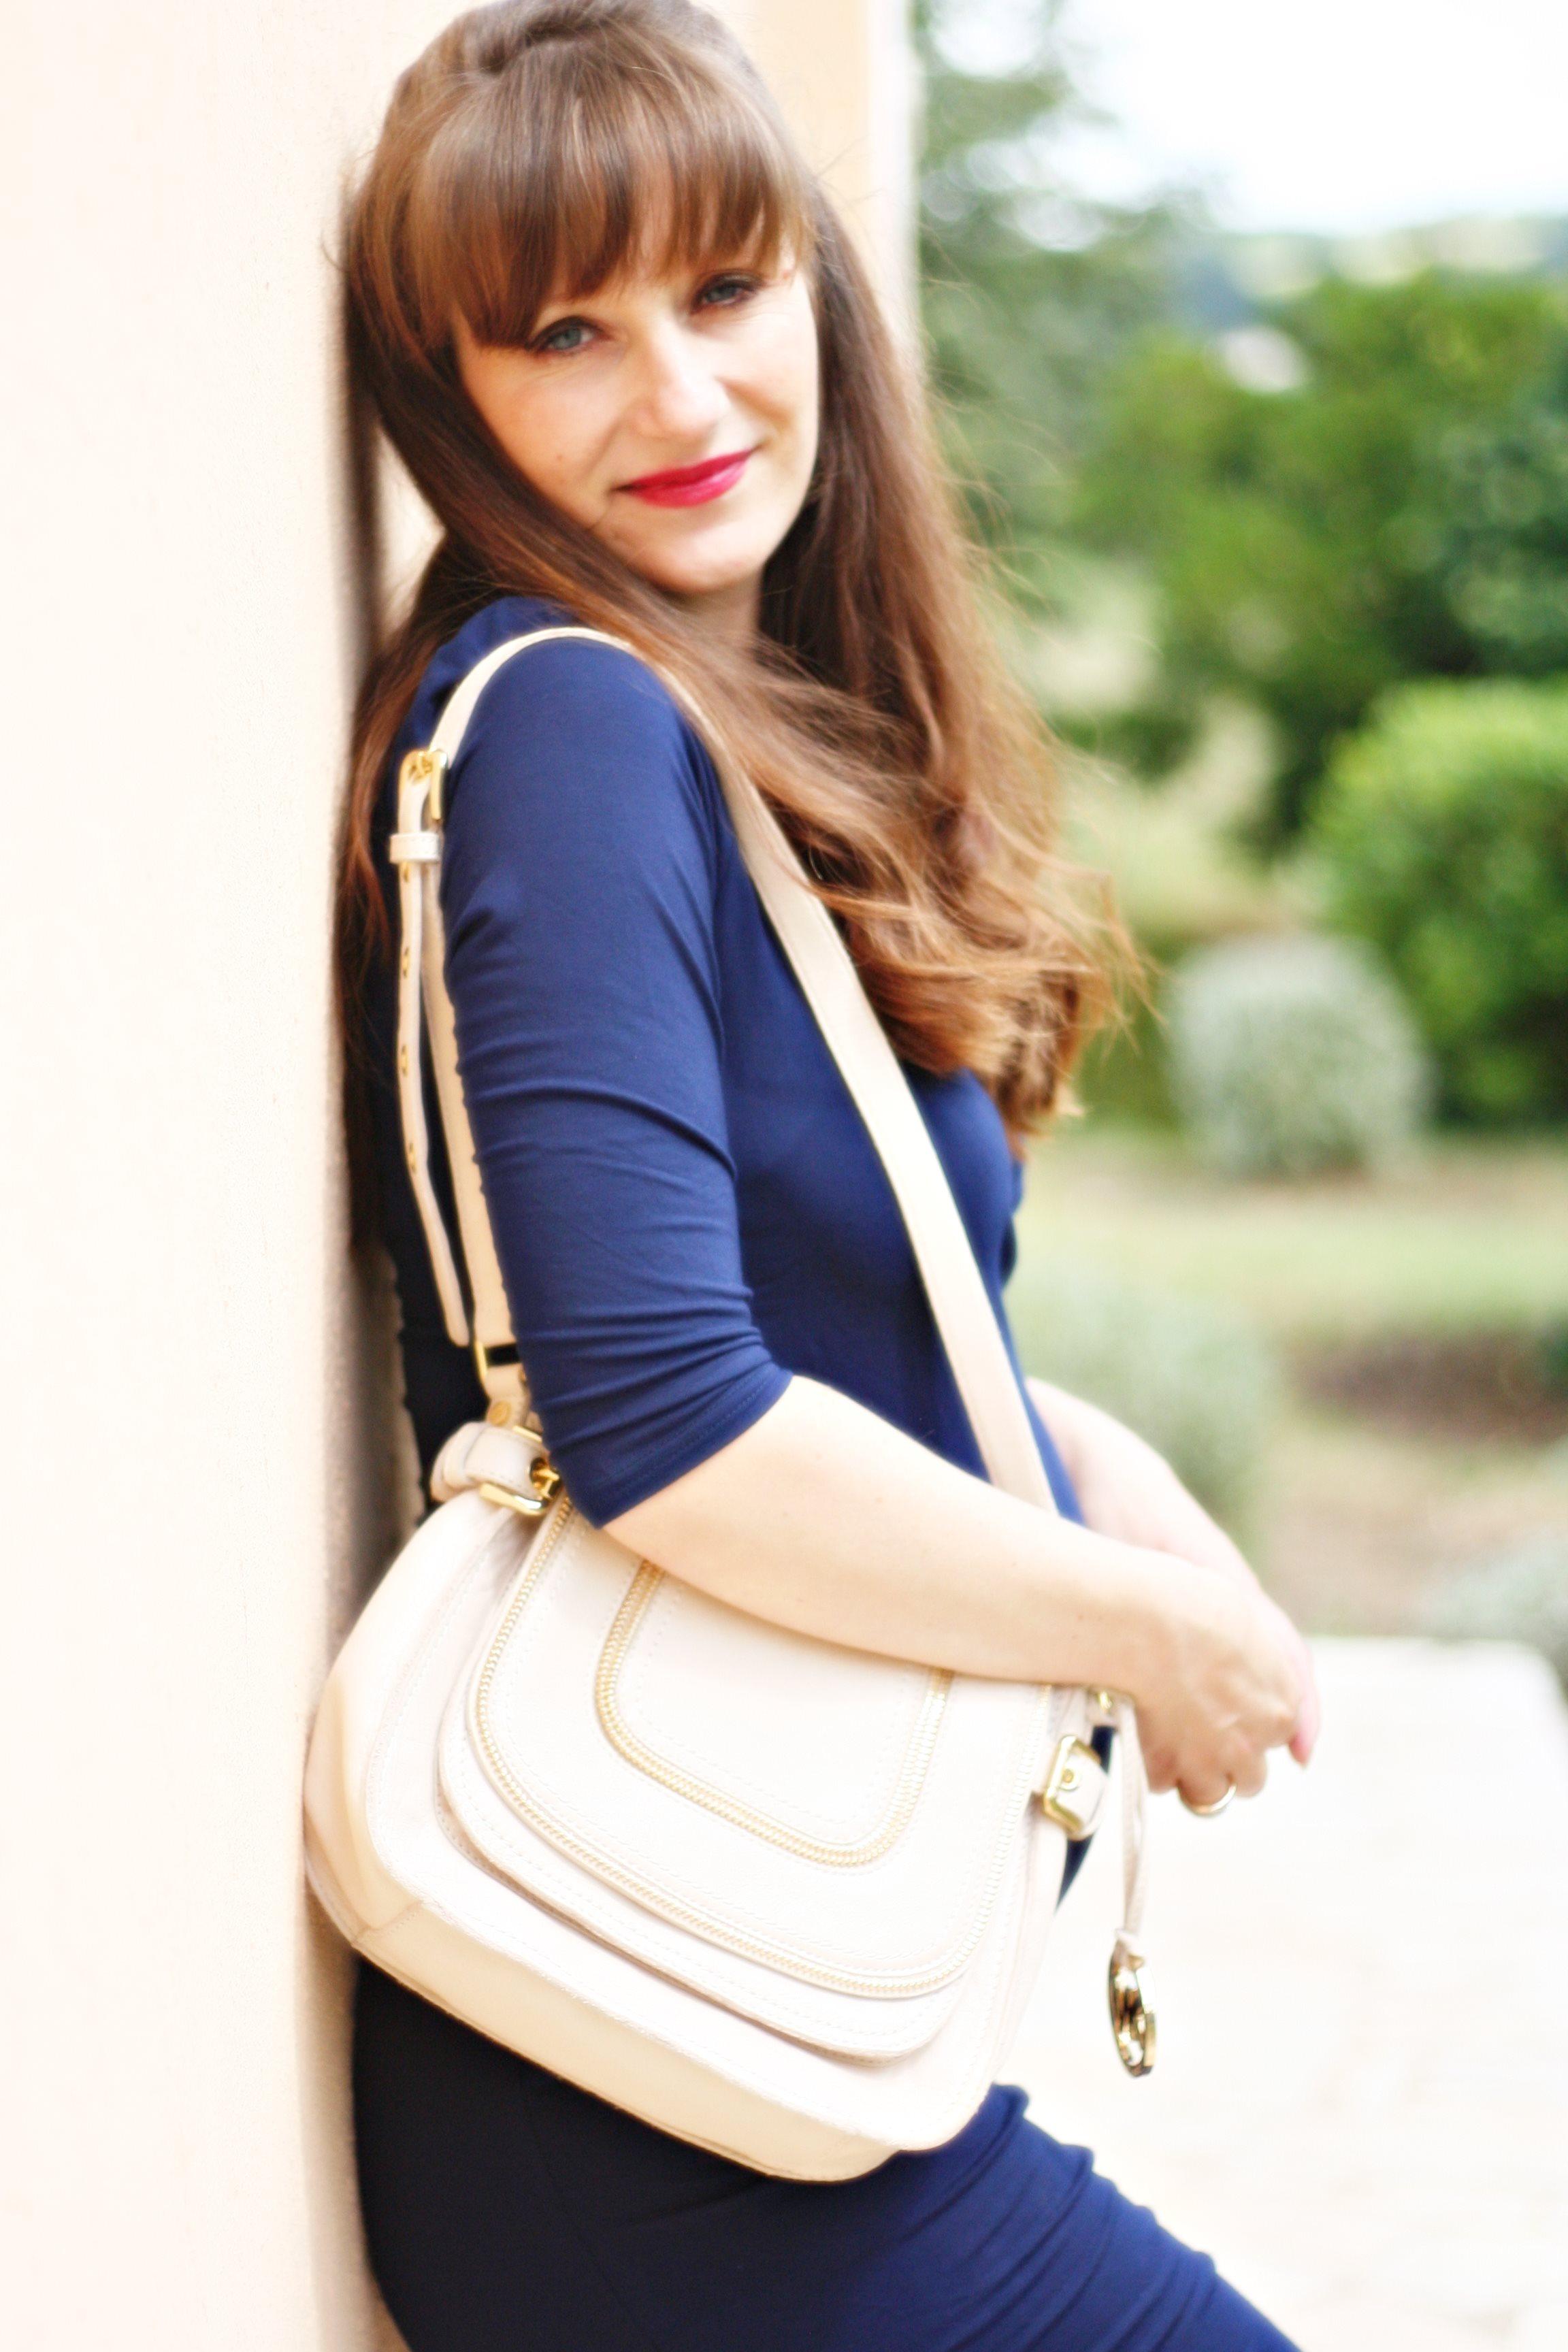 blog-mode-femme-marc-jacobs-ballerines-souris